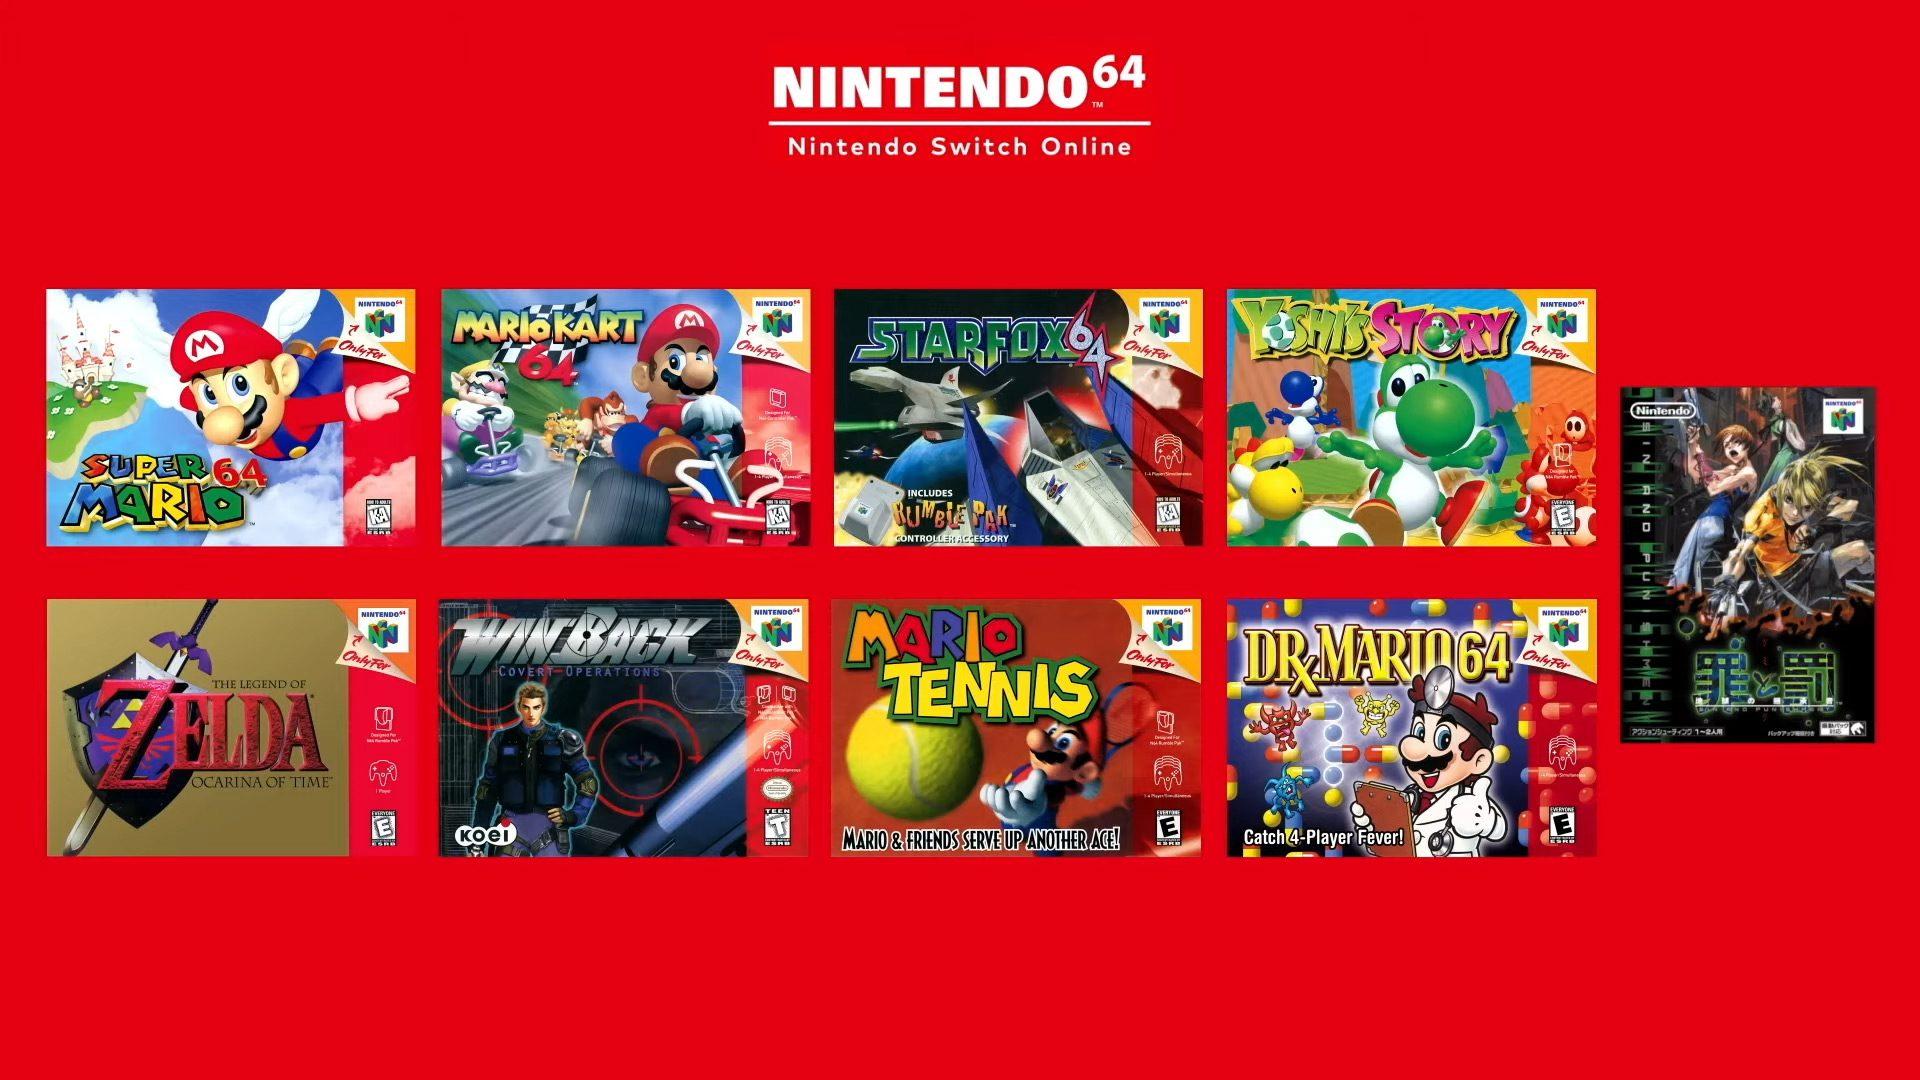 Nintendo Switch Online N64 games